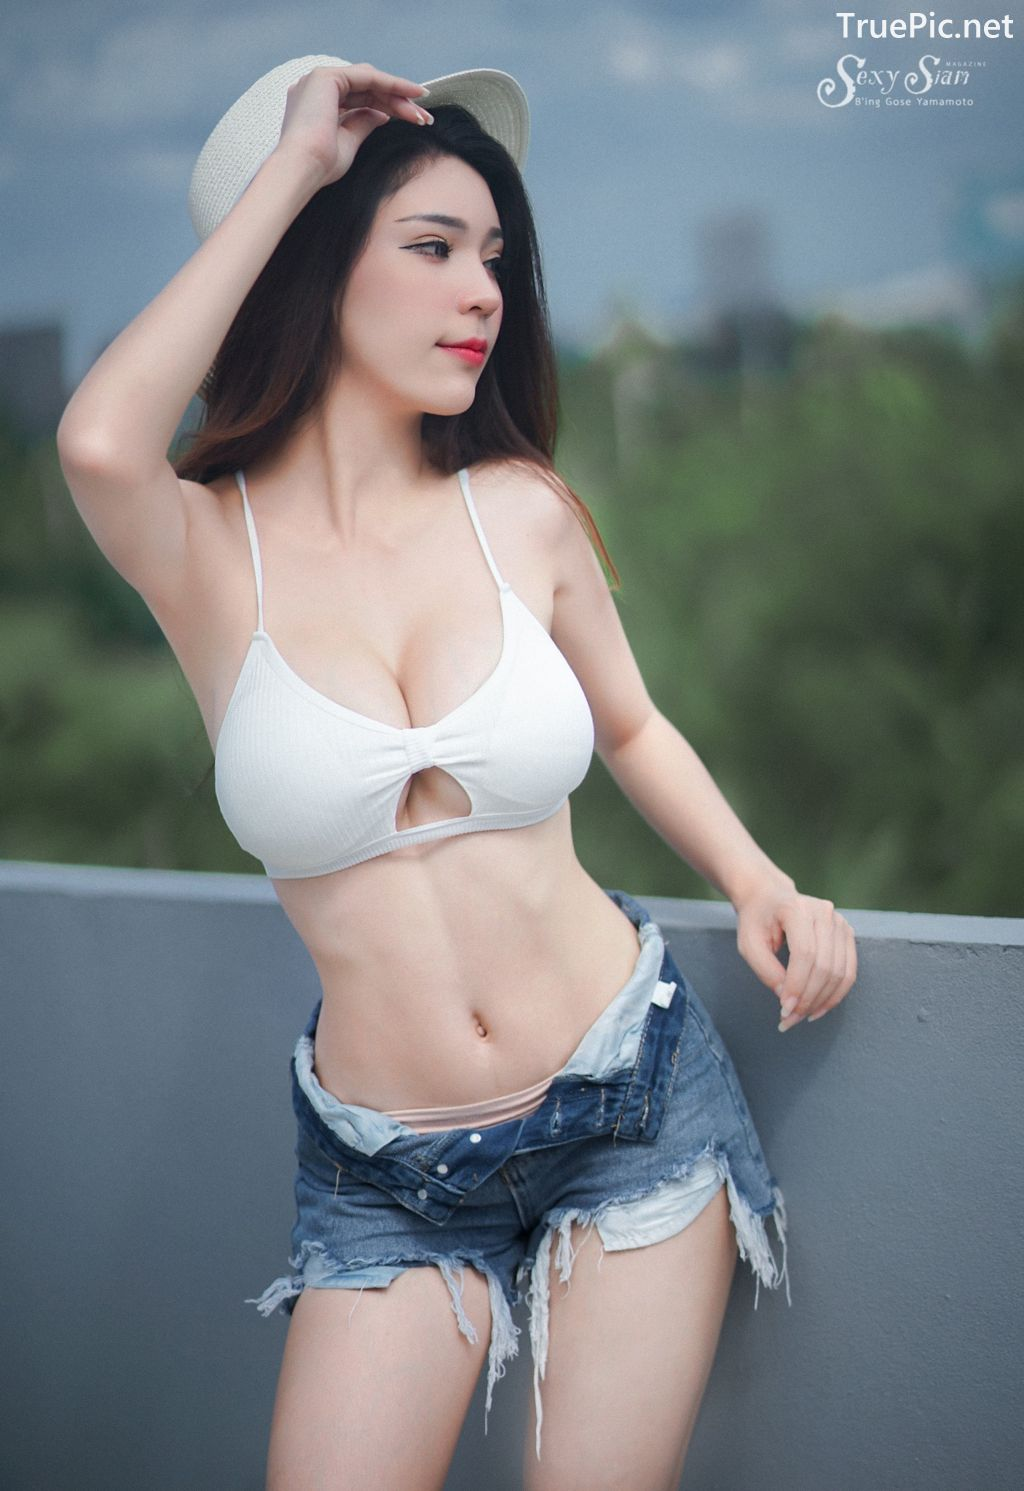 Image-Thailand Sexy Model-Janet-Kanokwan-Saesim-White-Bra-And-Jean-TruePic.net- Picture-3